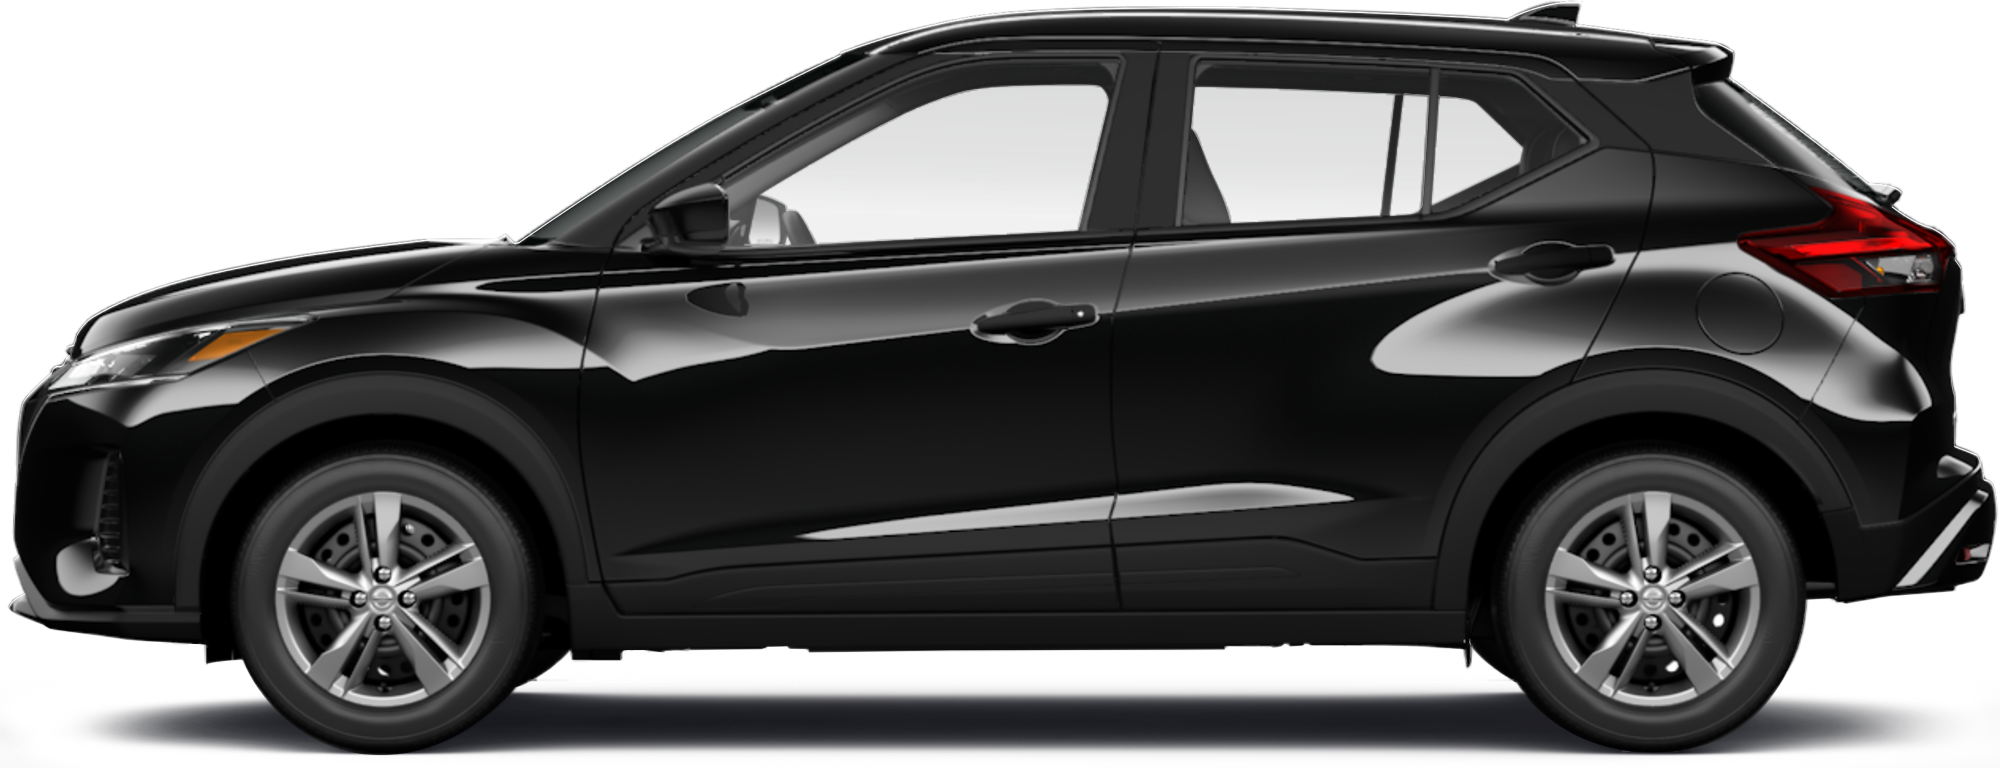 2021 Nissan Kicks SUV S